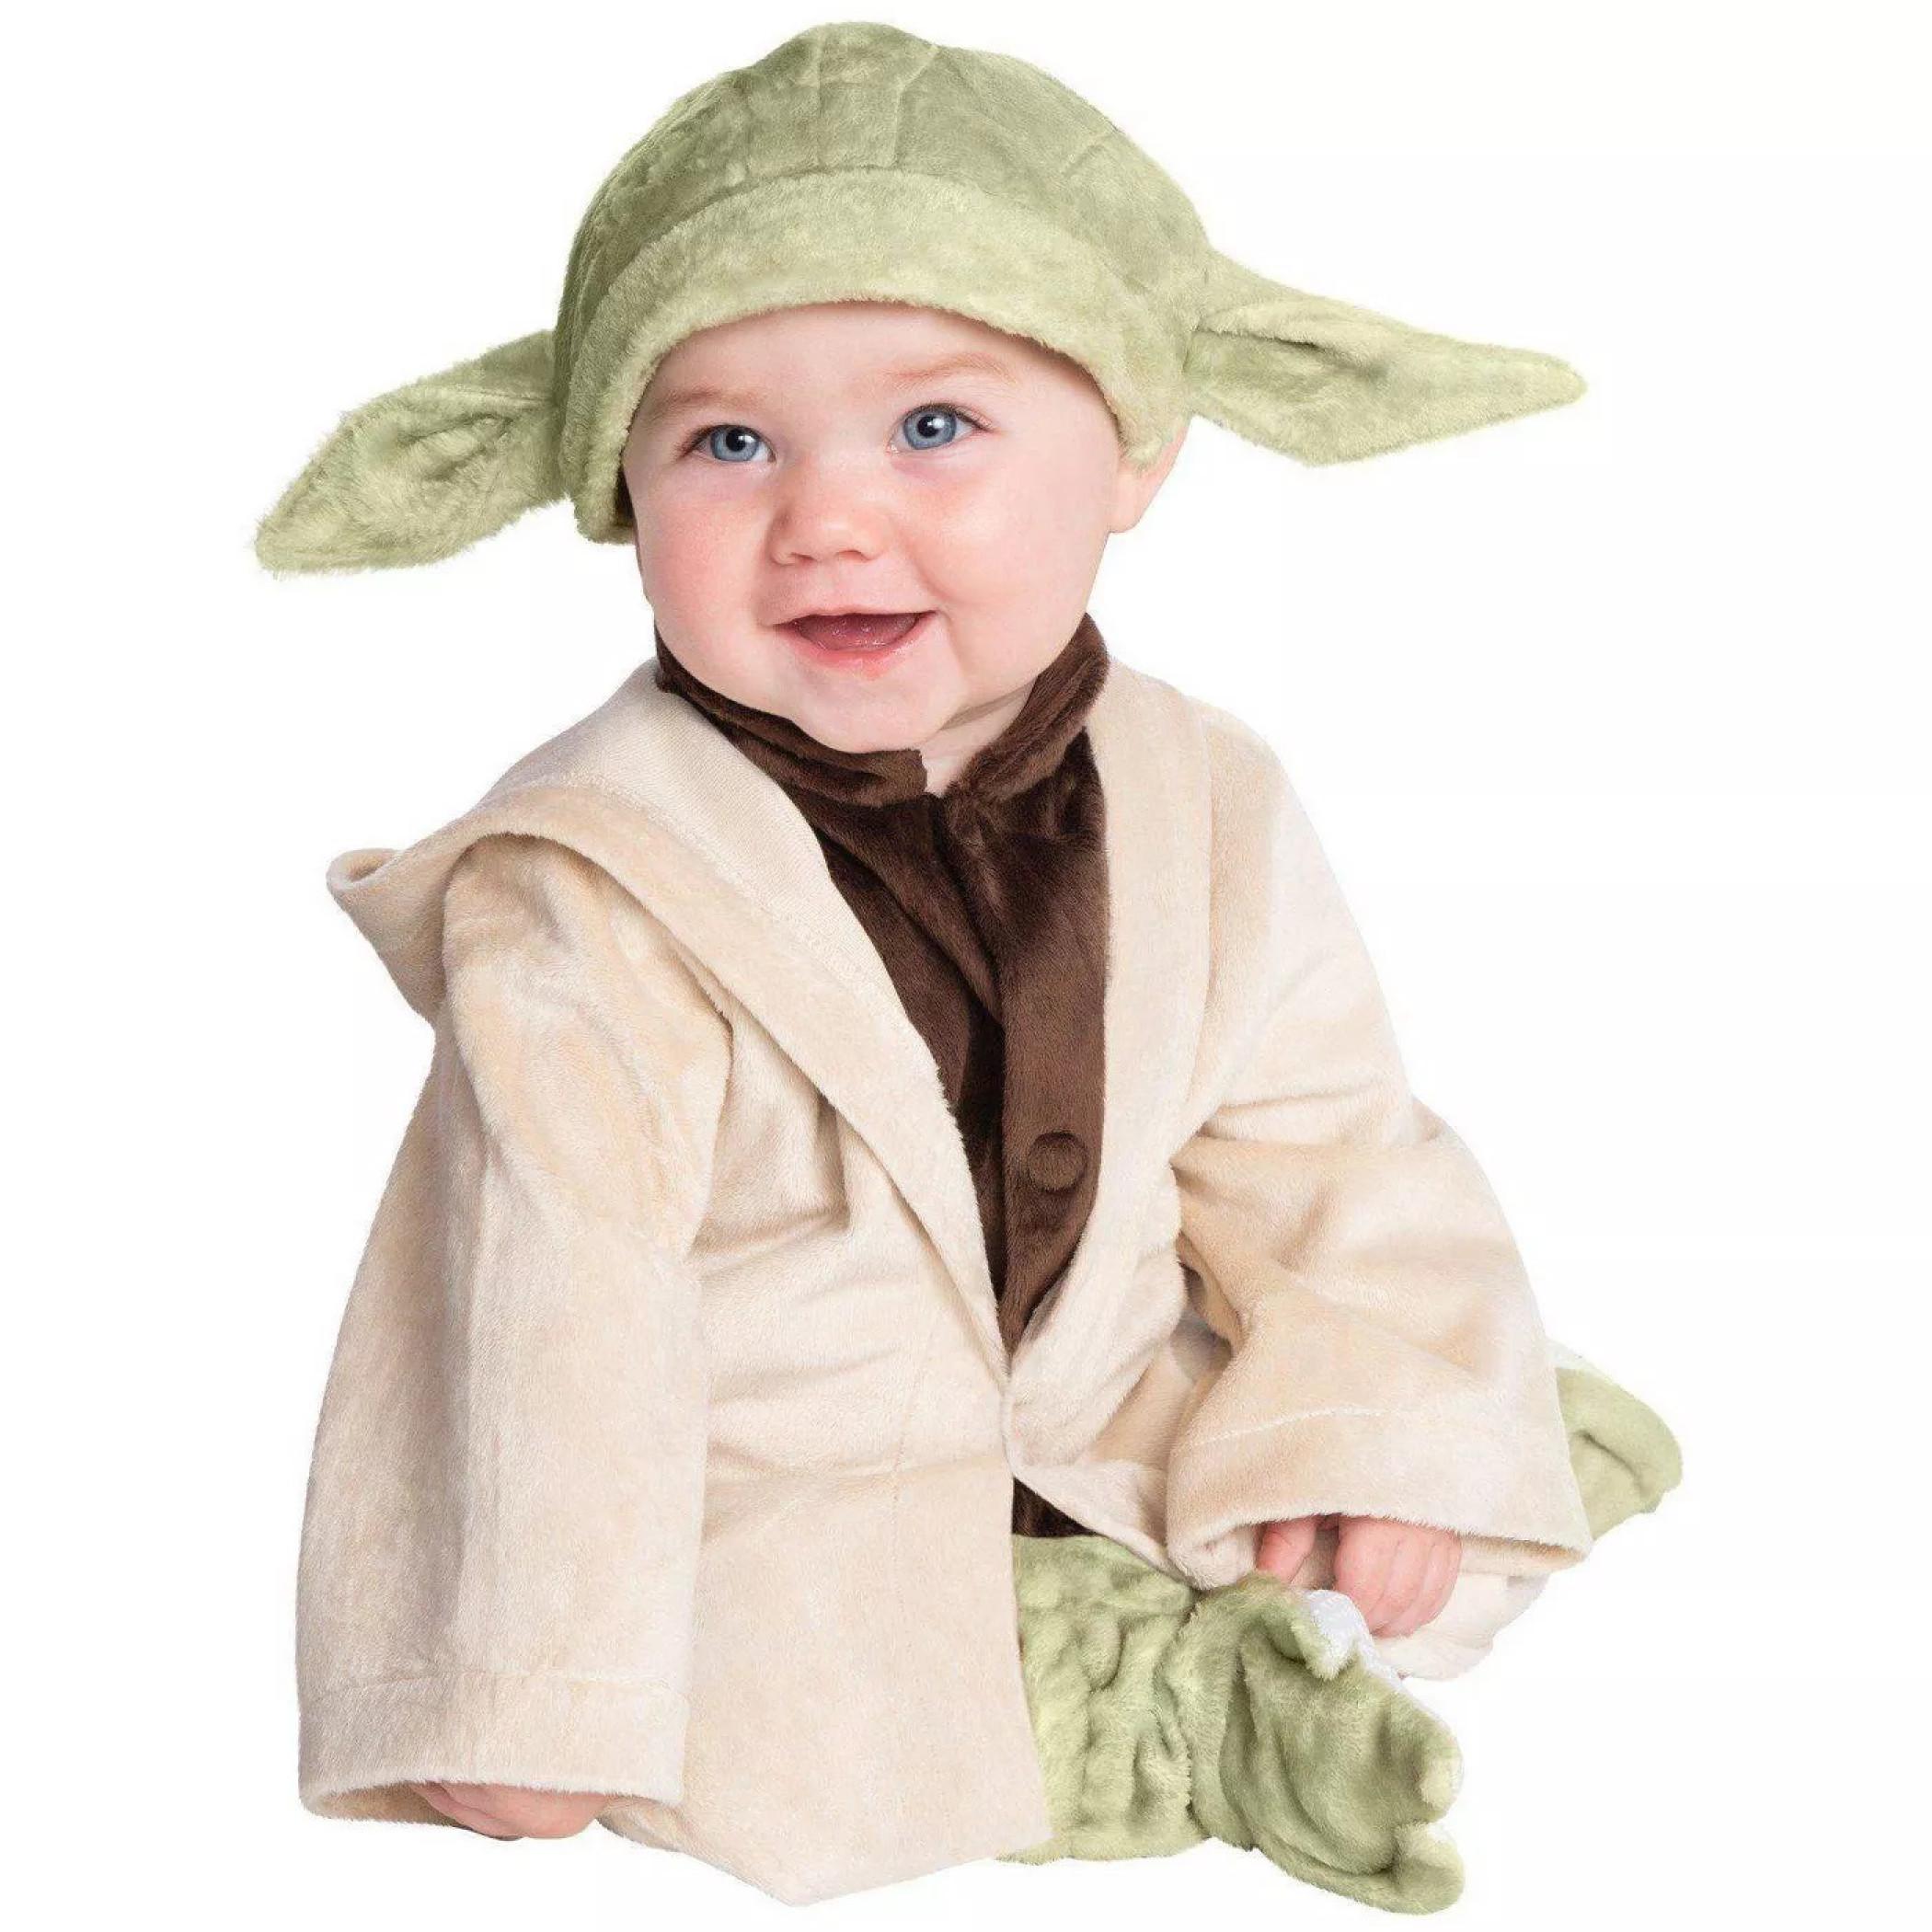 Star Wars Yoda Toddlers Costume